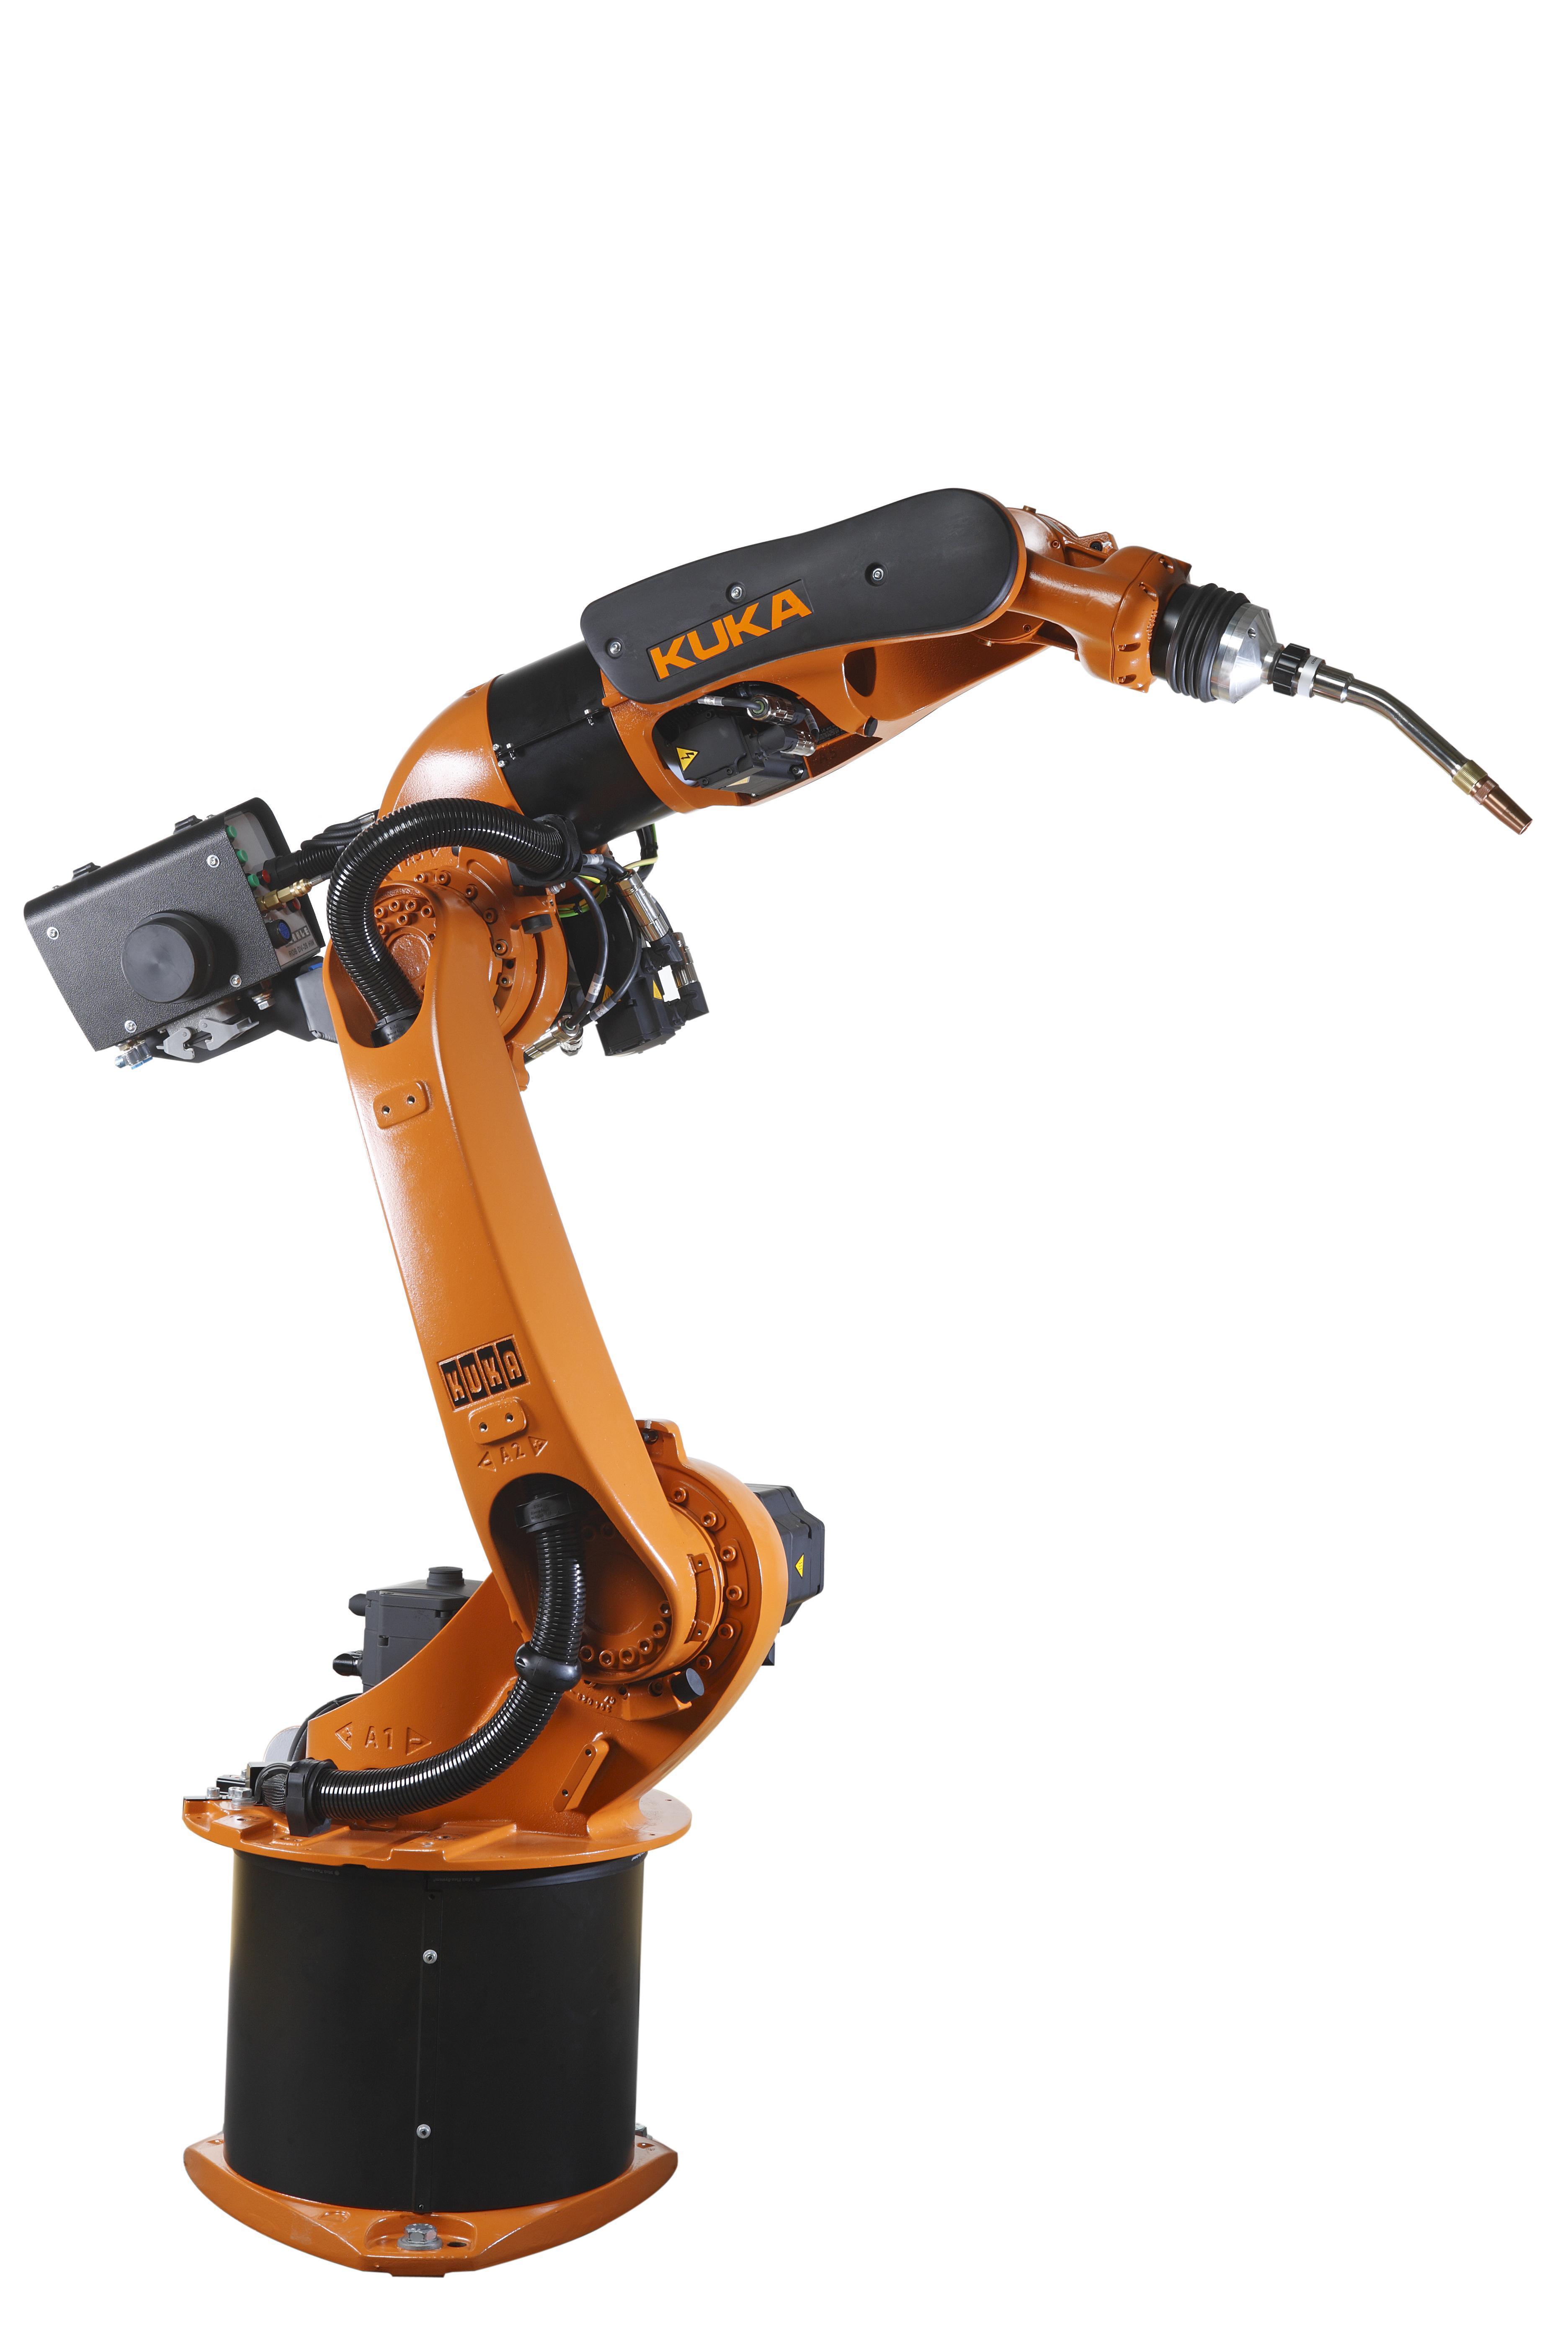 Making The Cut With Kuka Robotics Corporation At Fabtech